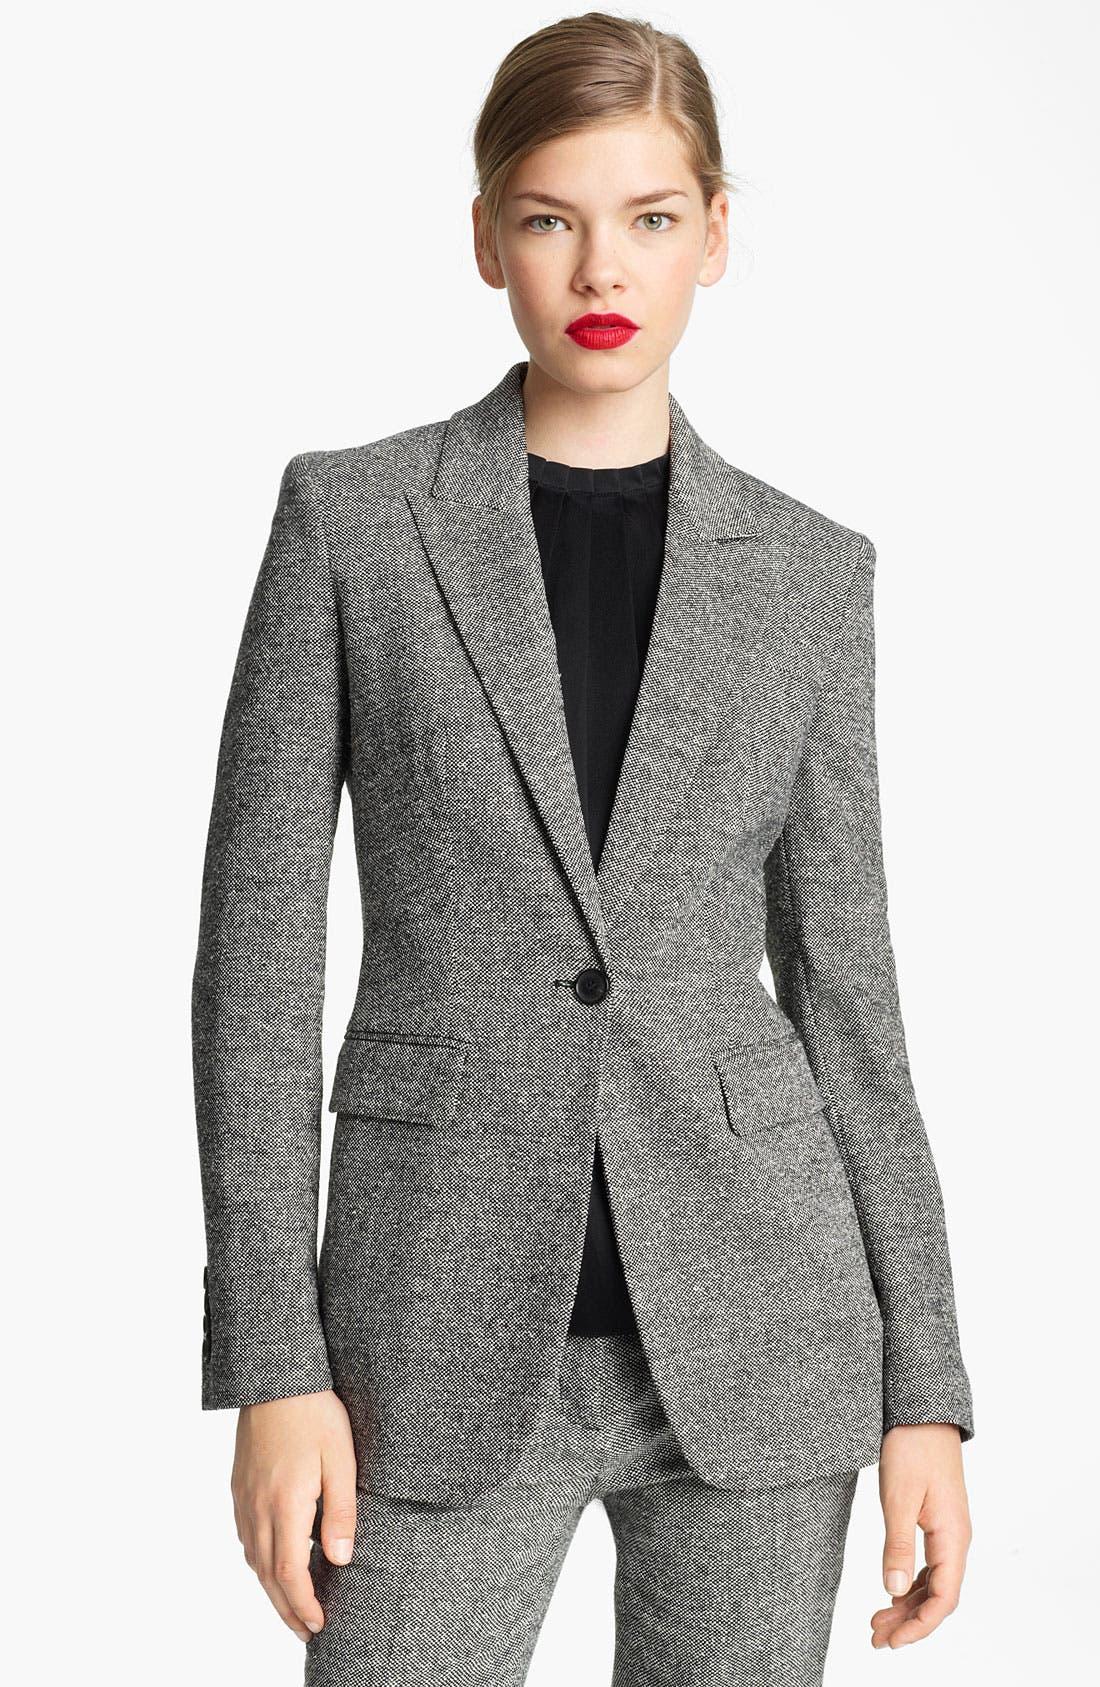 Alternate Image 1 Selected - Michael Kors Donegal Tweed Blazer